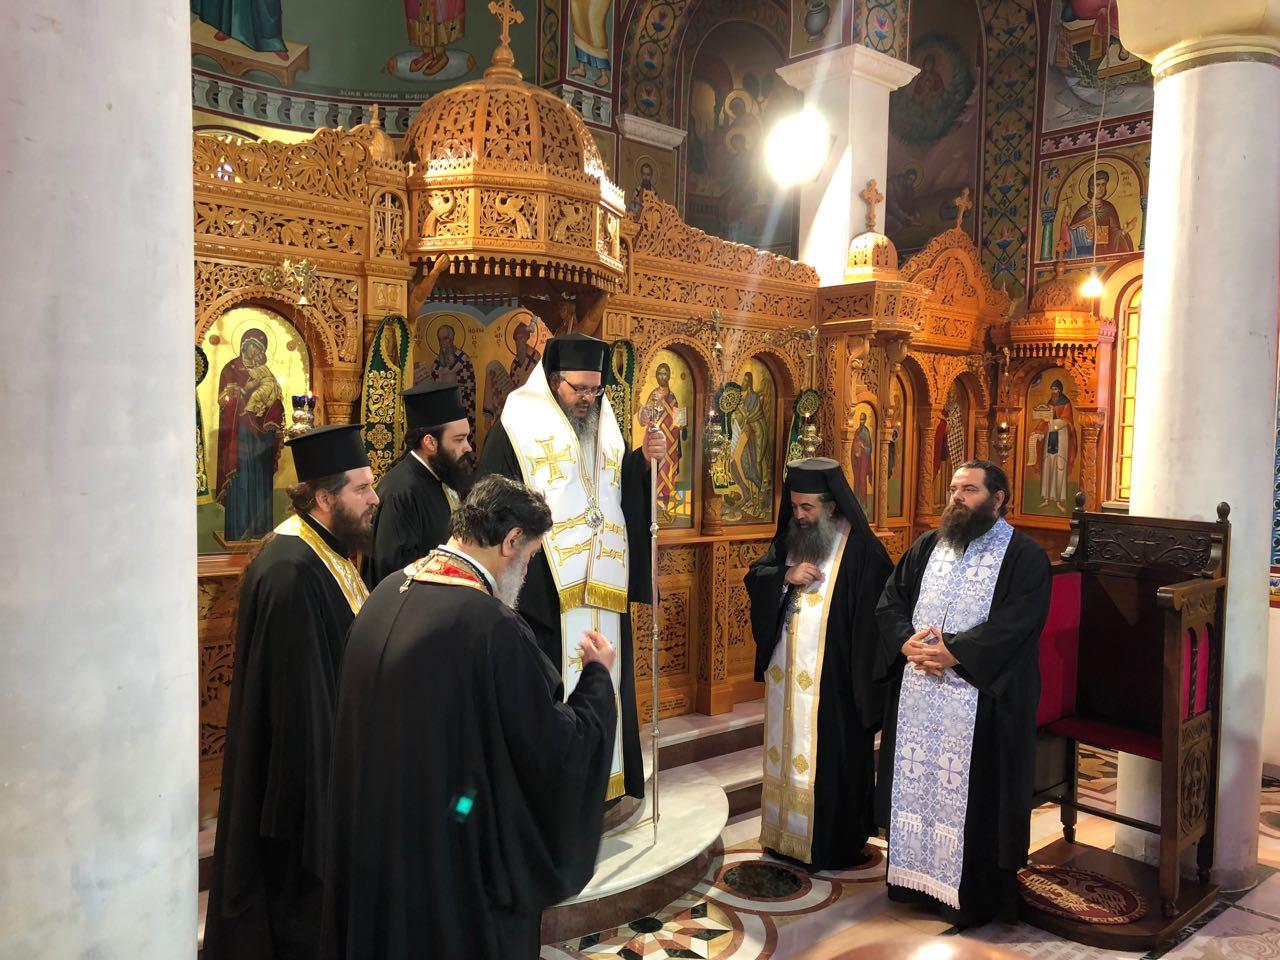 trisagio ygeionomikou 1 - Εκκλησιαστικά Νέα και Ειδήσεις